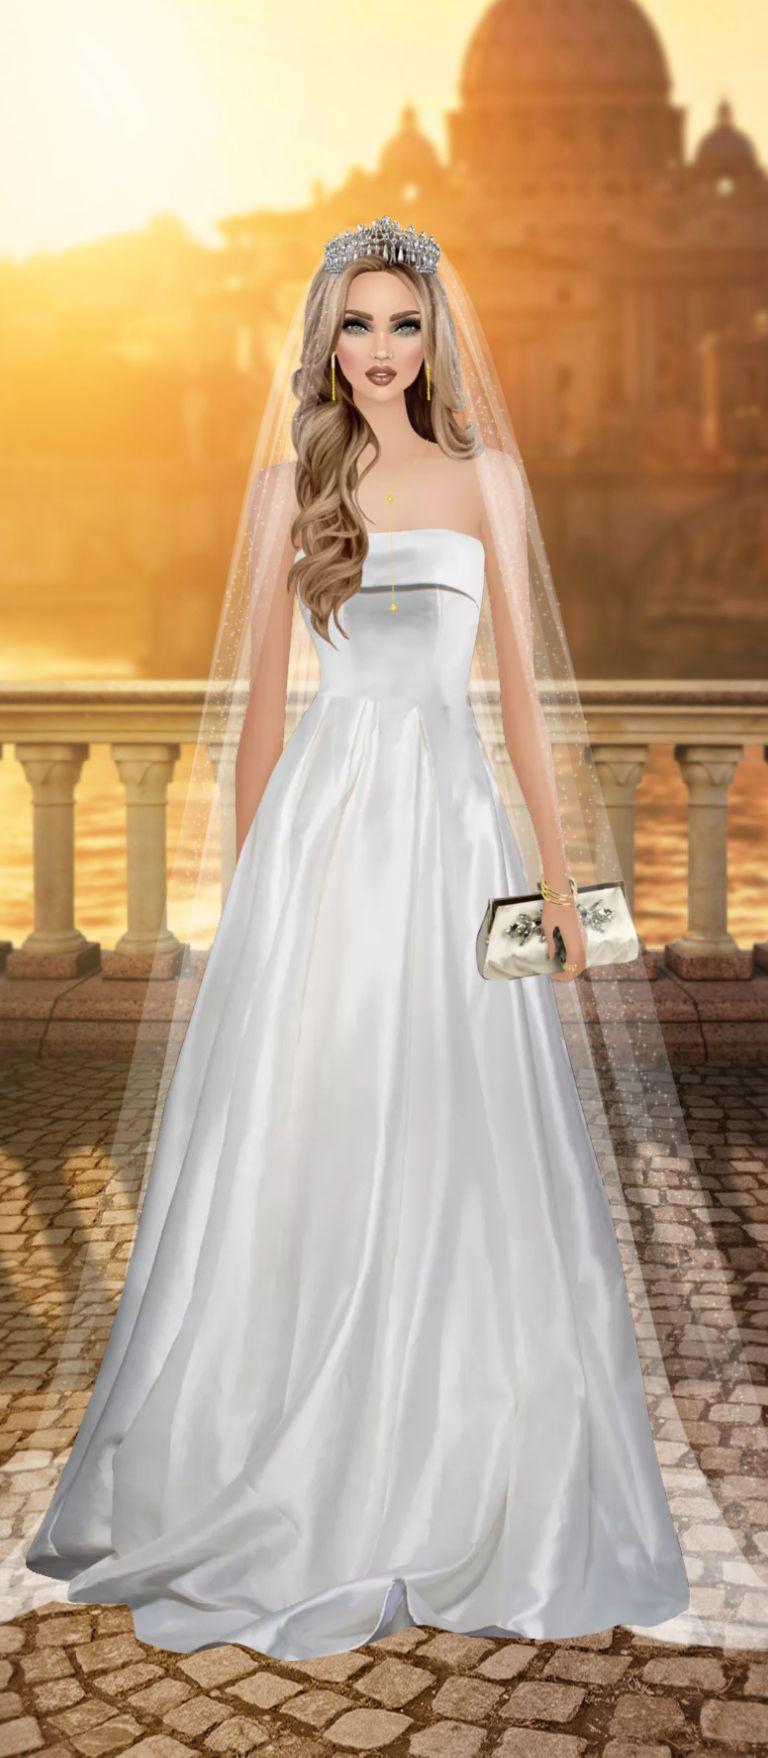 Wedding Dress Designers Game.Girl Wedding Dress Design Games Dacc